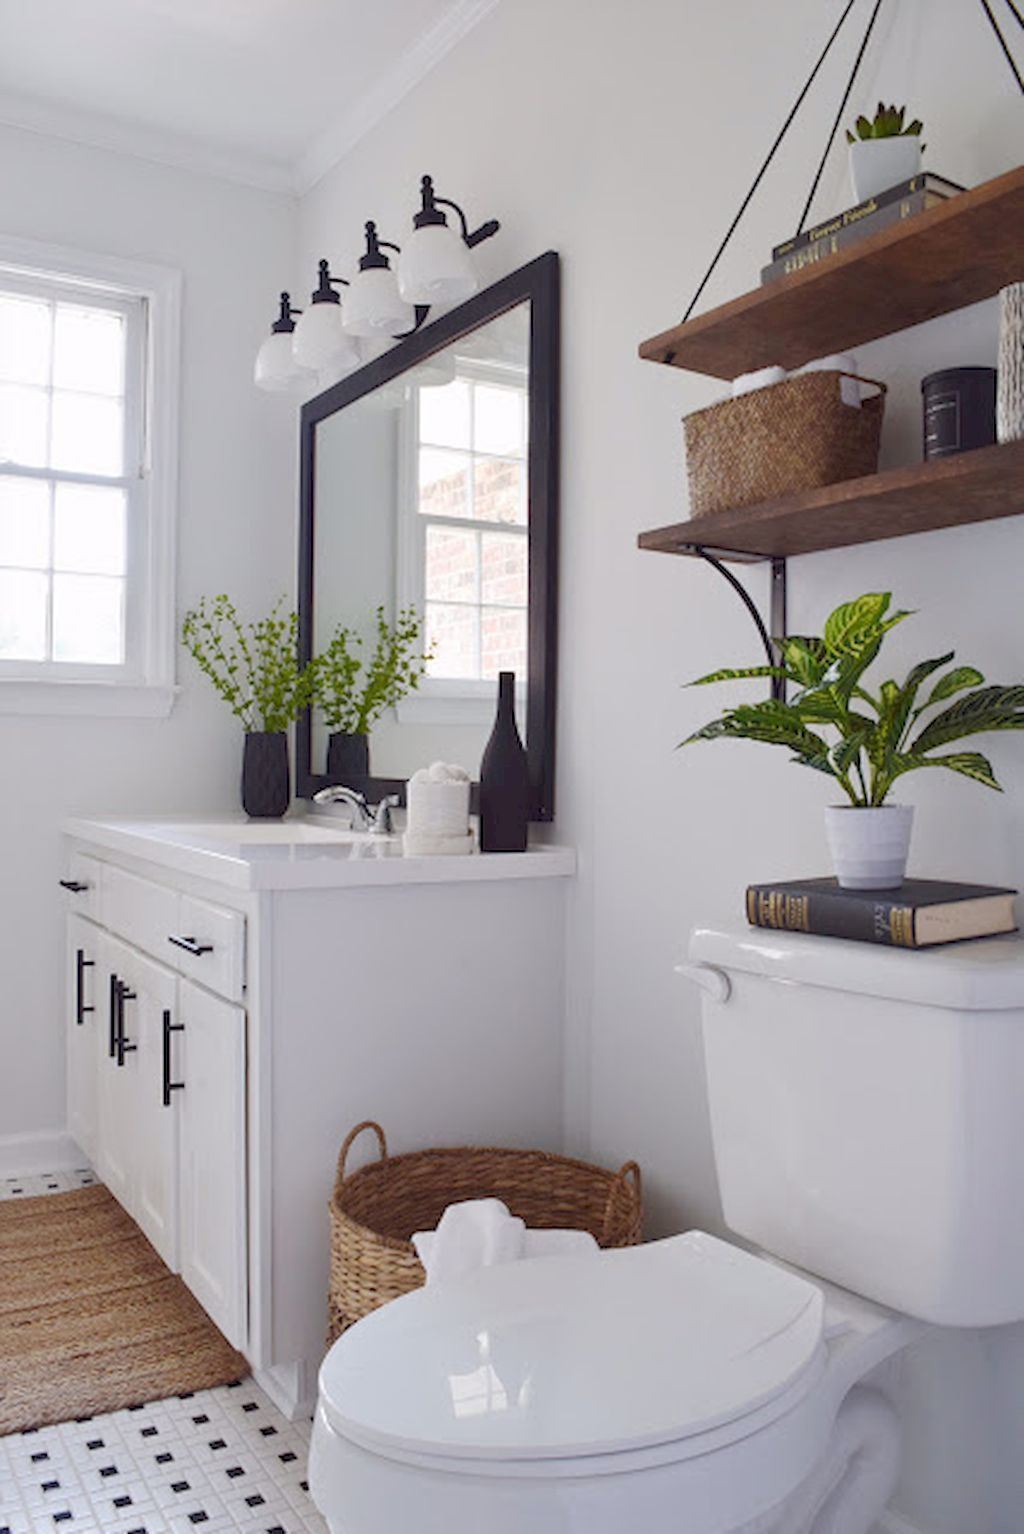 Ideas Modern Farmhouse Bathroom For Small Spaces 19 in